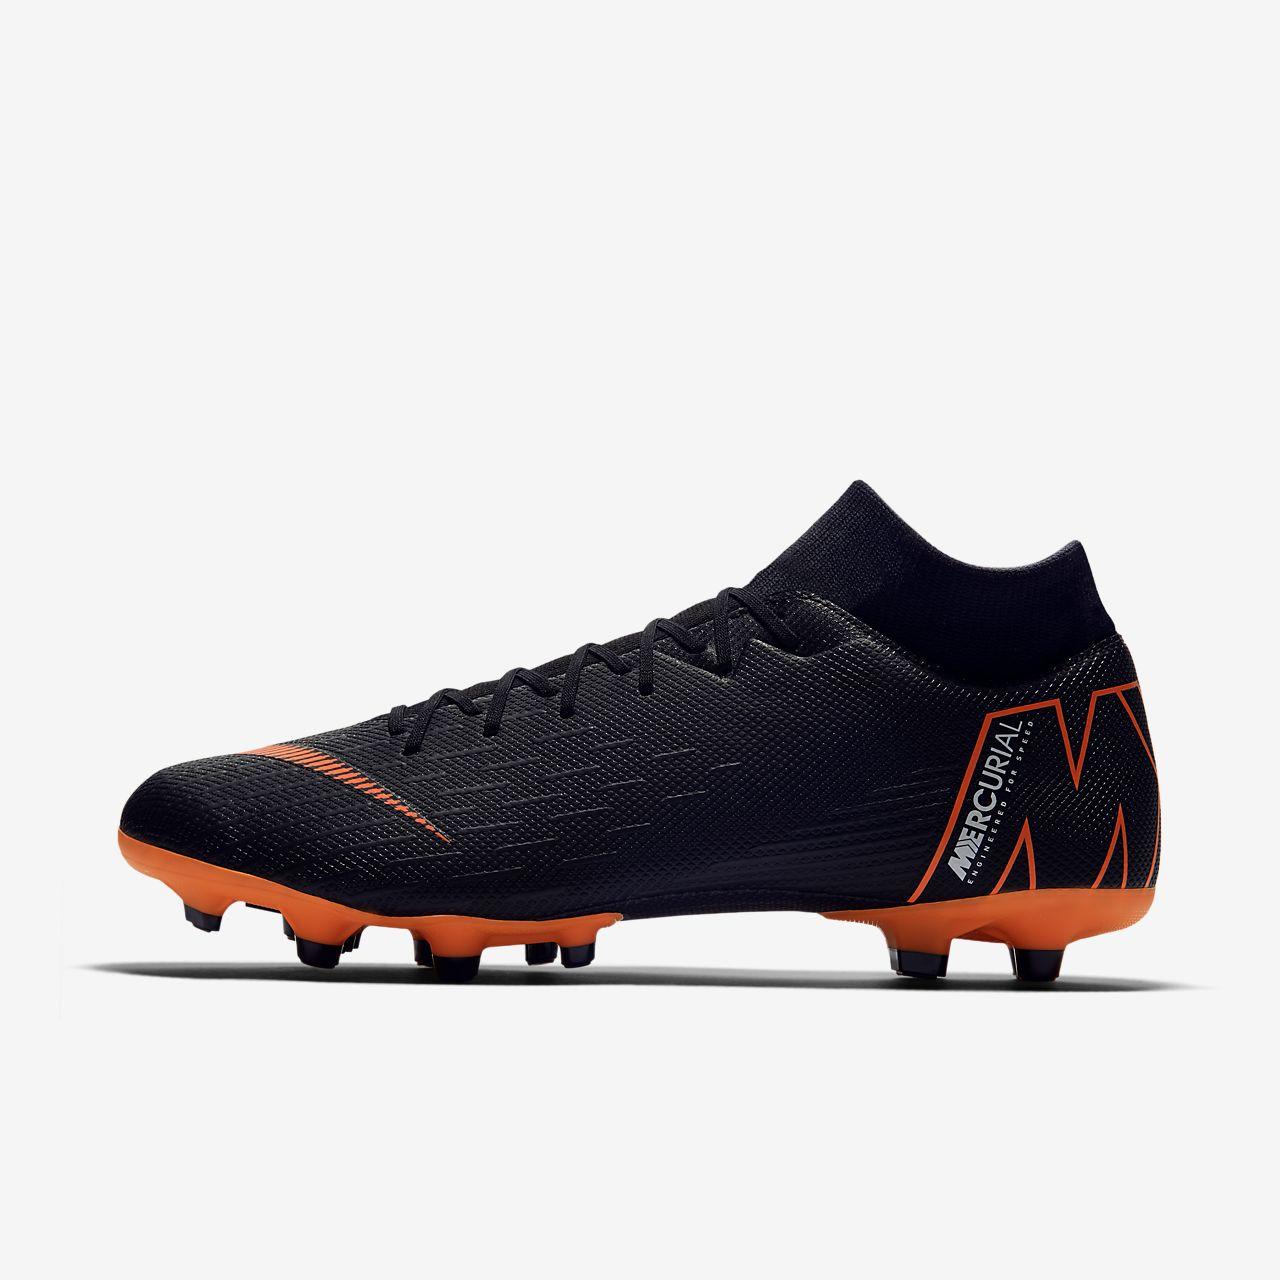 57e385470b1f Nike Mercurial Superfly VI Academy Multi-Ground Football Boot. Nike ...